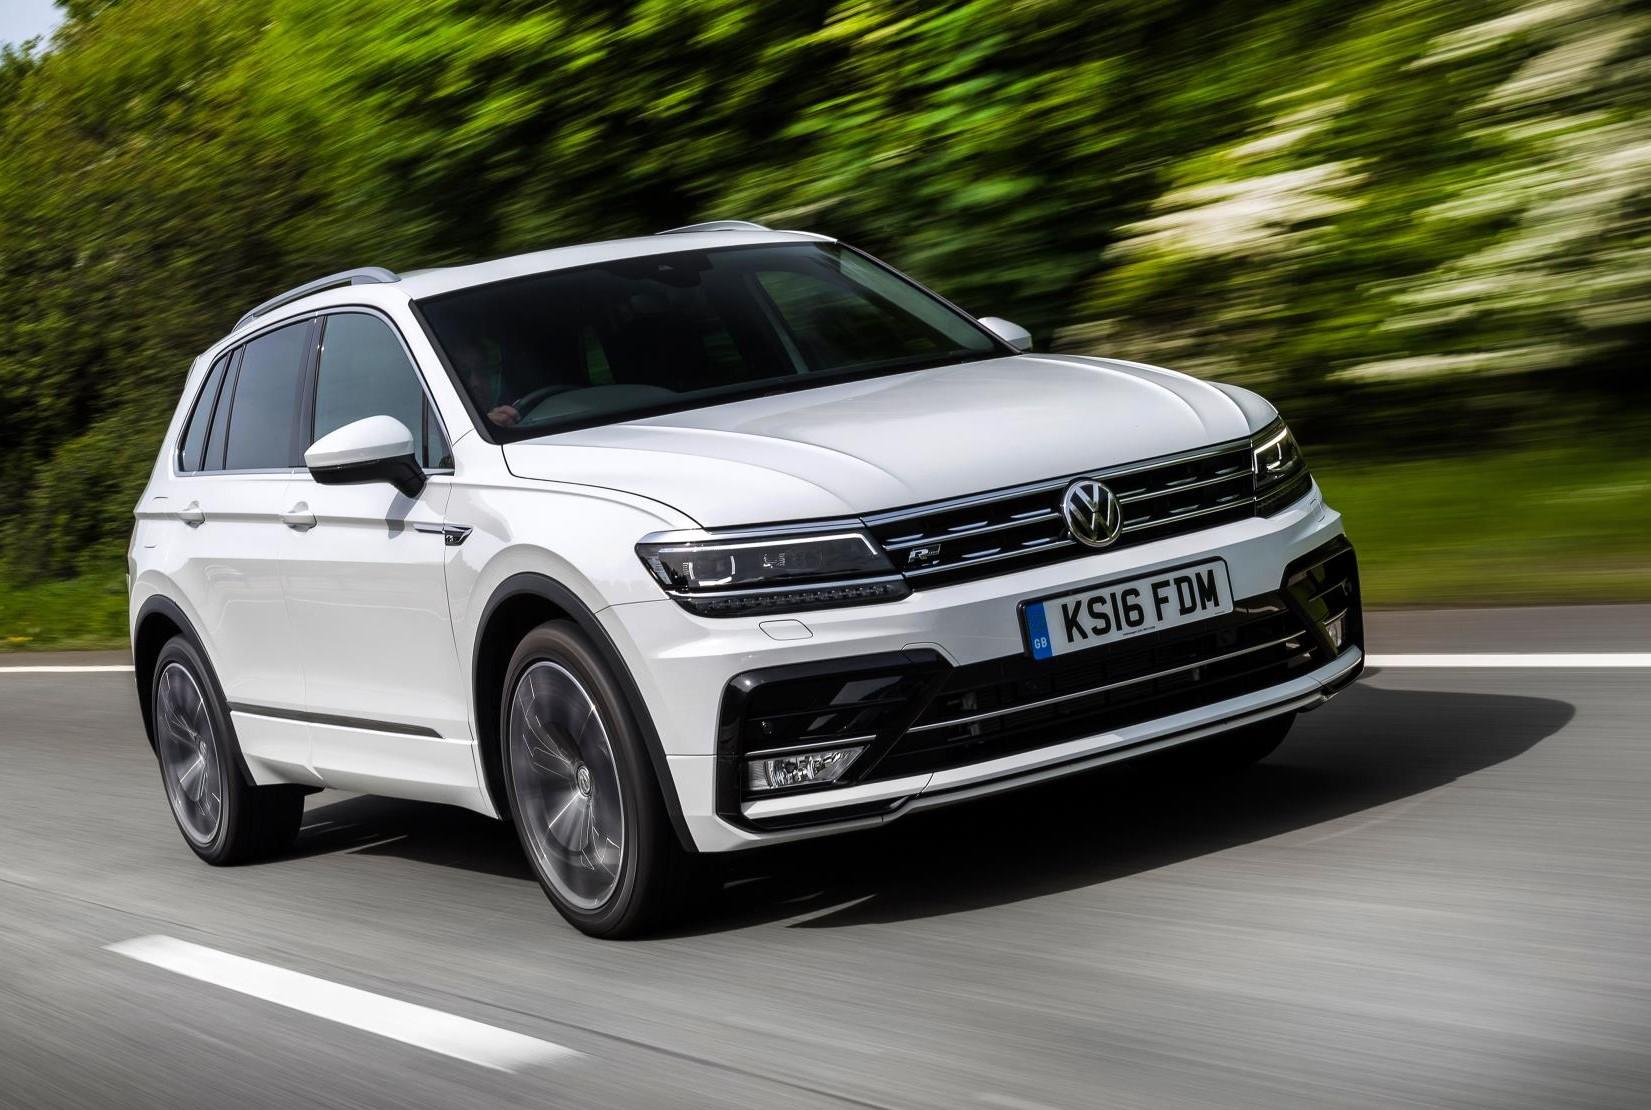 concept leasing tsi volkswagen advance passat gte vehicle saloon dsg business cars